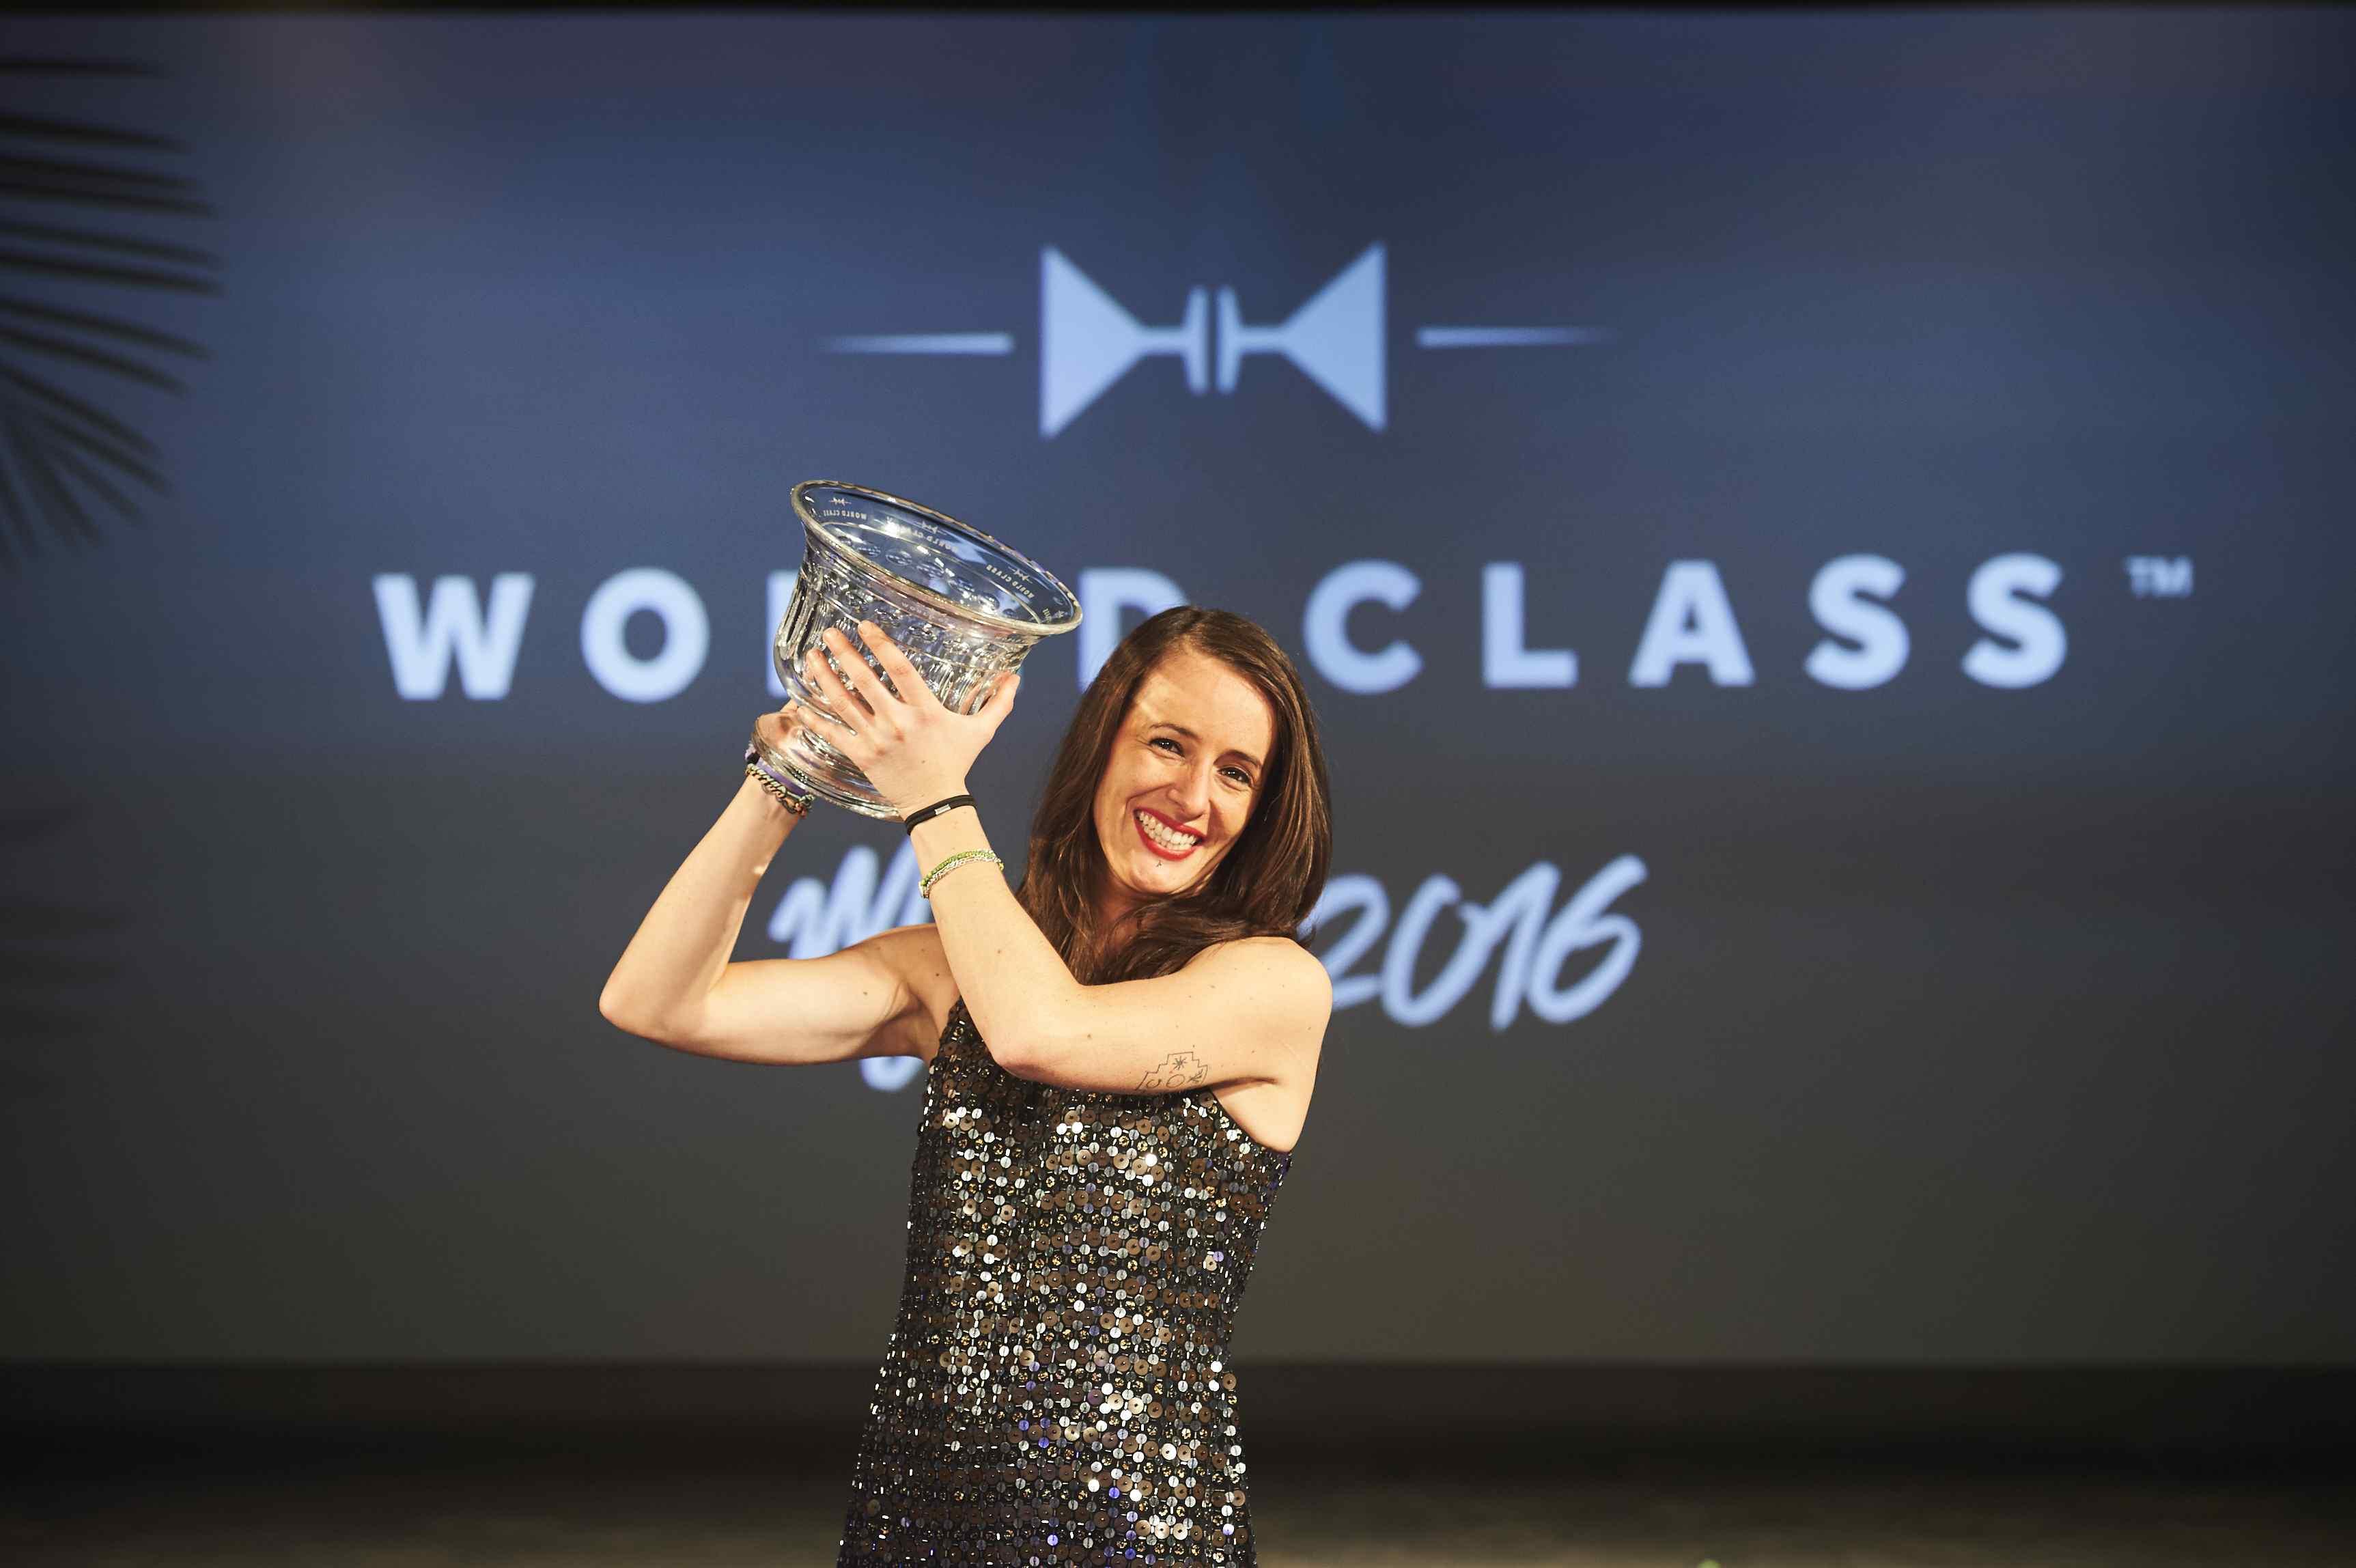 Jennifer Le Nechet, World Class Bartender of the Year